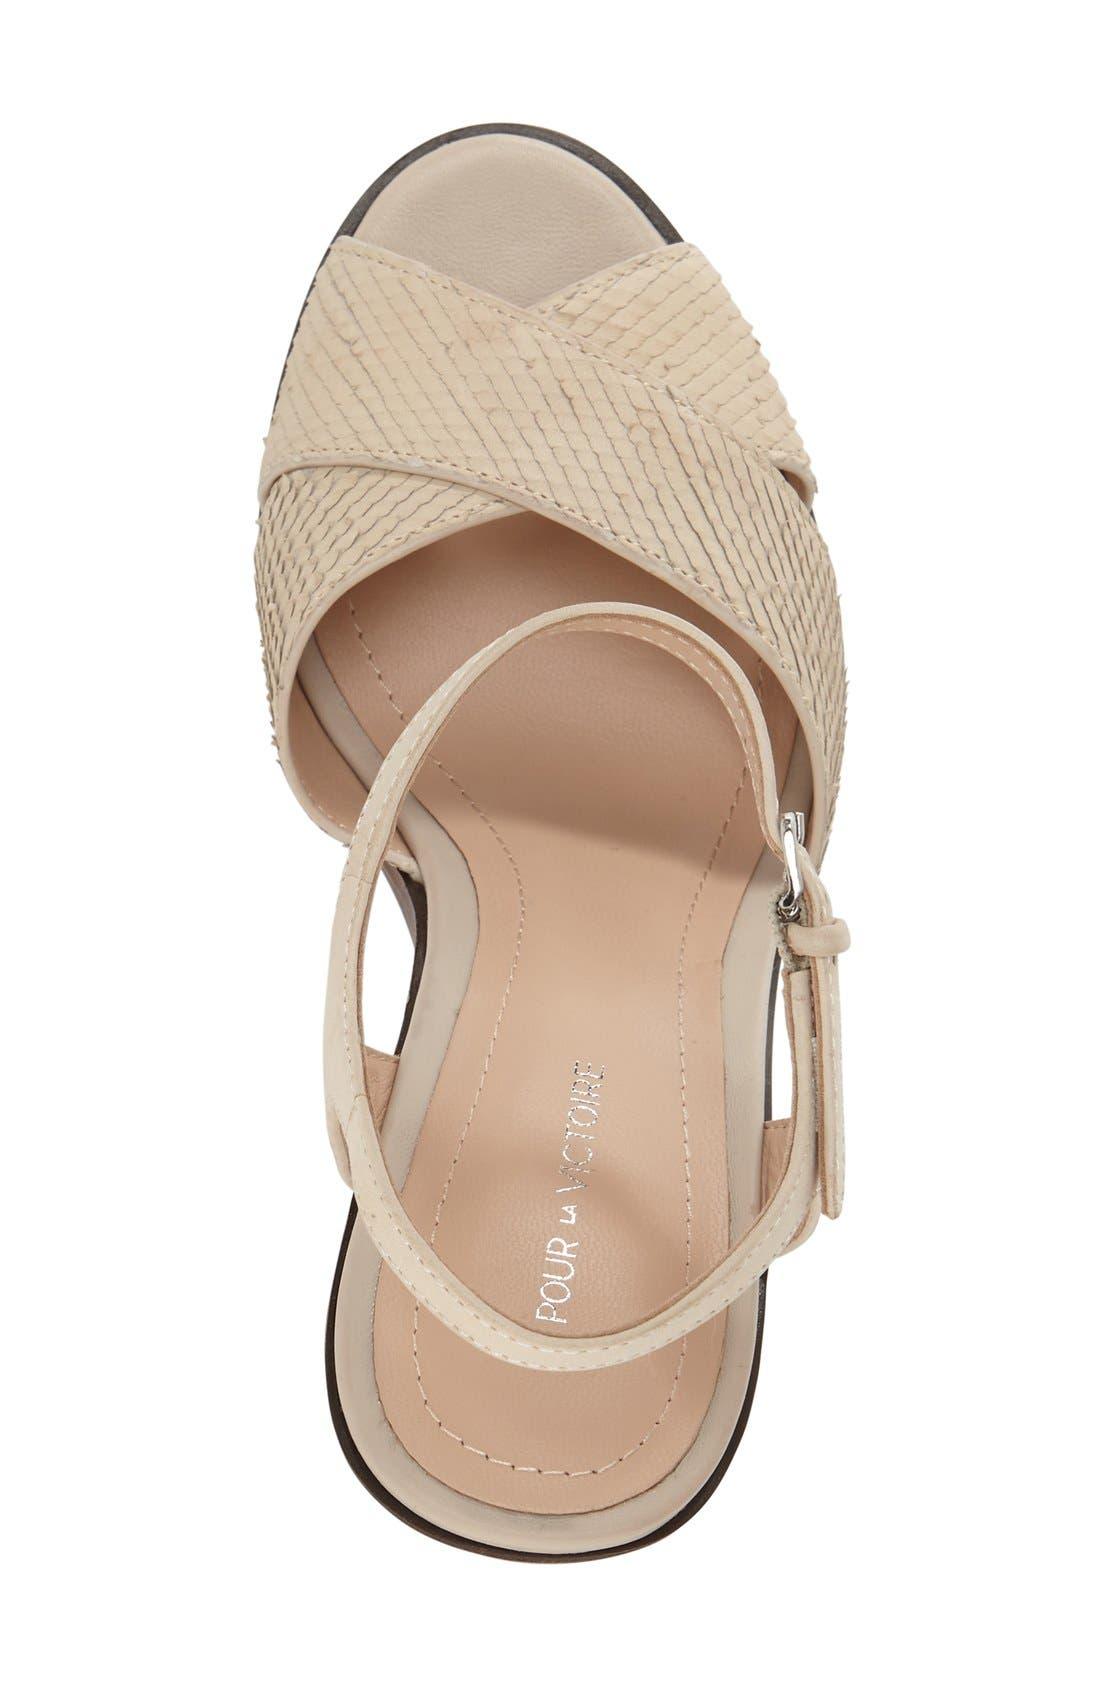 'Dakota' Platform Sandal,                             Alternate thumbnail 3, color,                             Bone Leather